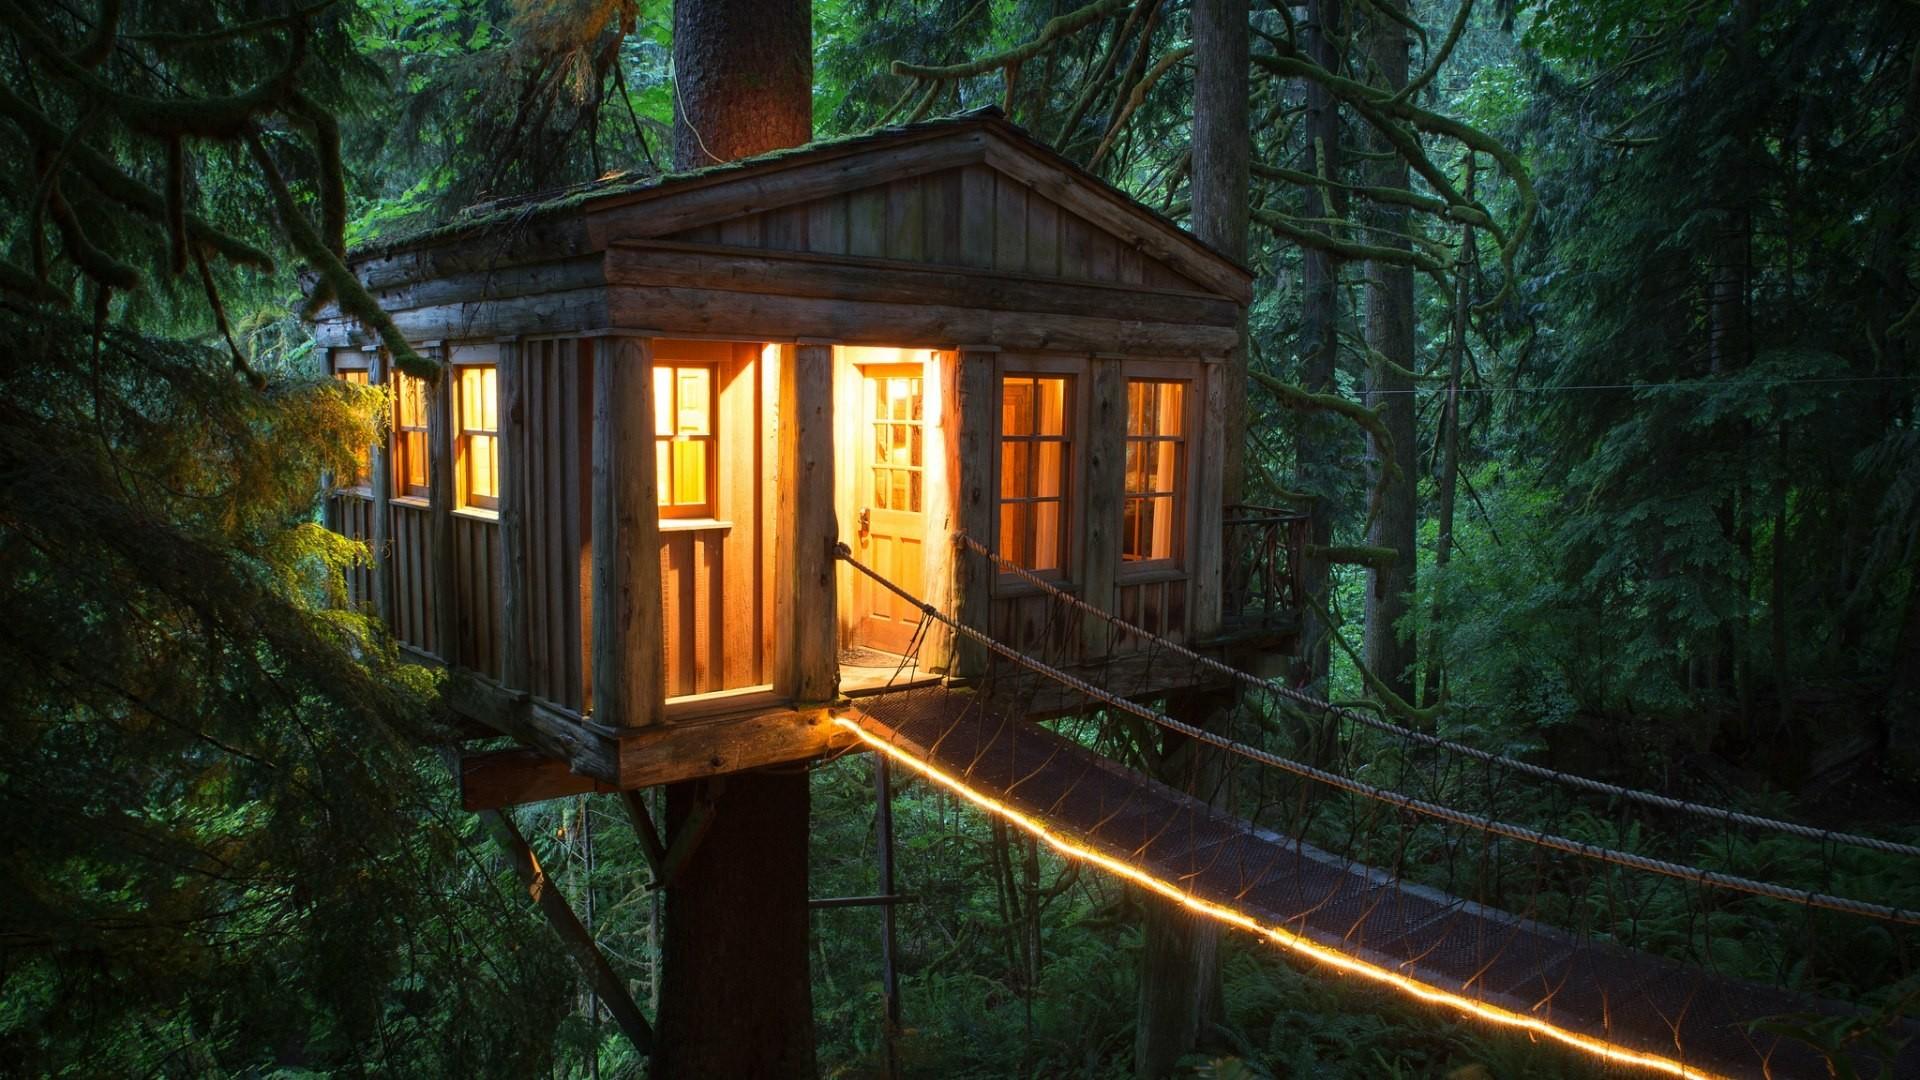 General 1920x1080 tree house outdoors warm trees plants bridge nature green lights door window hut yellow